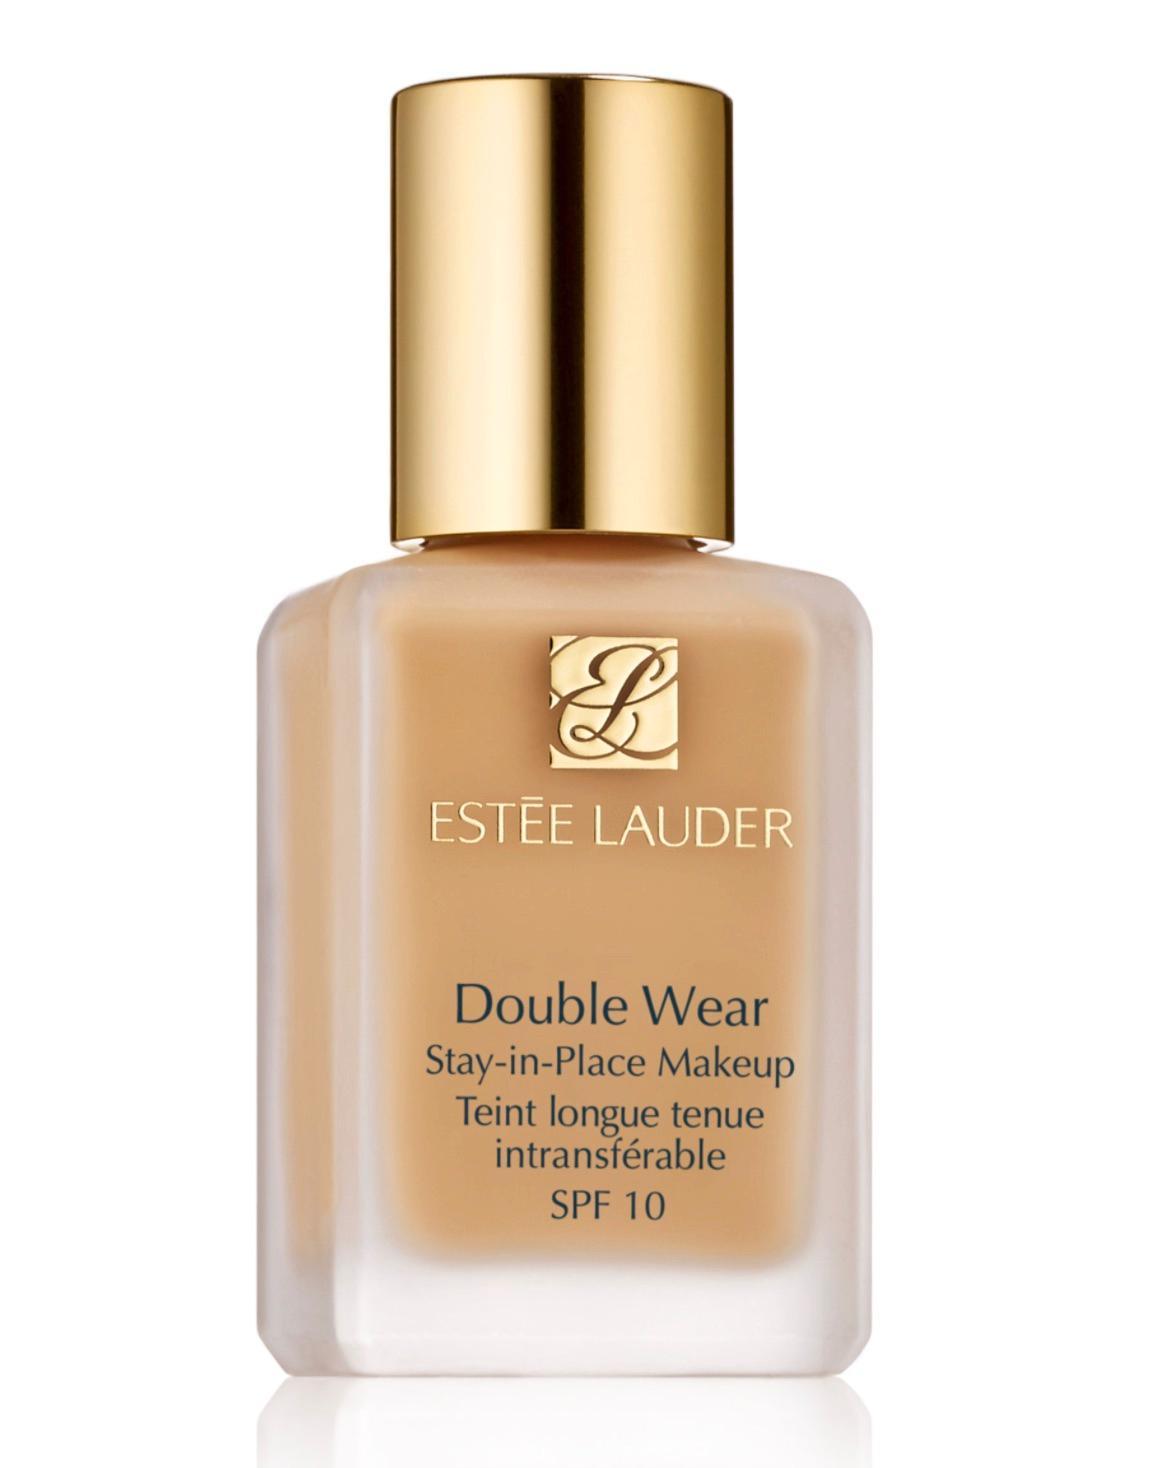 Bild på Estee Lauder Double wear